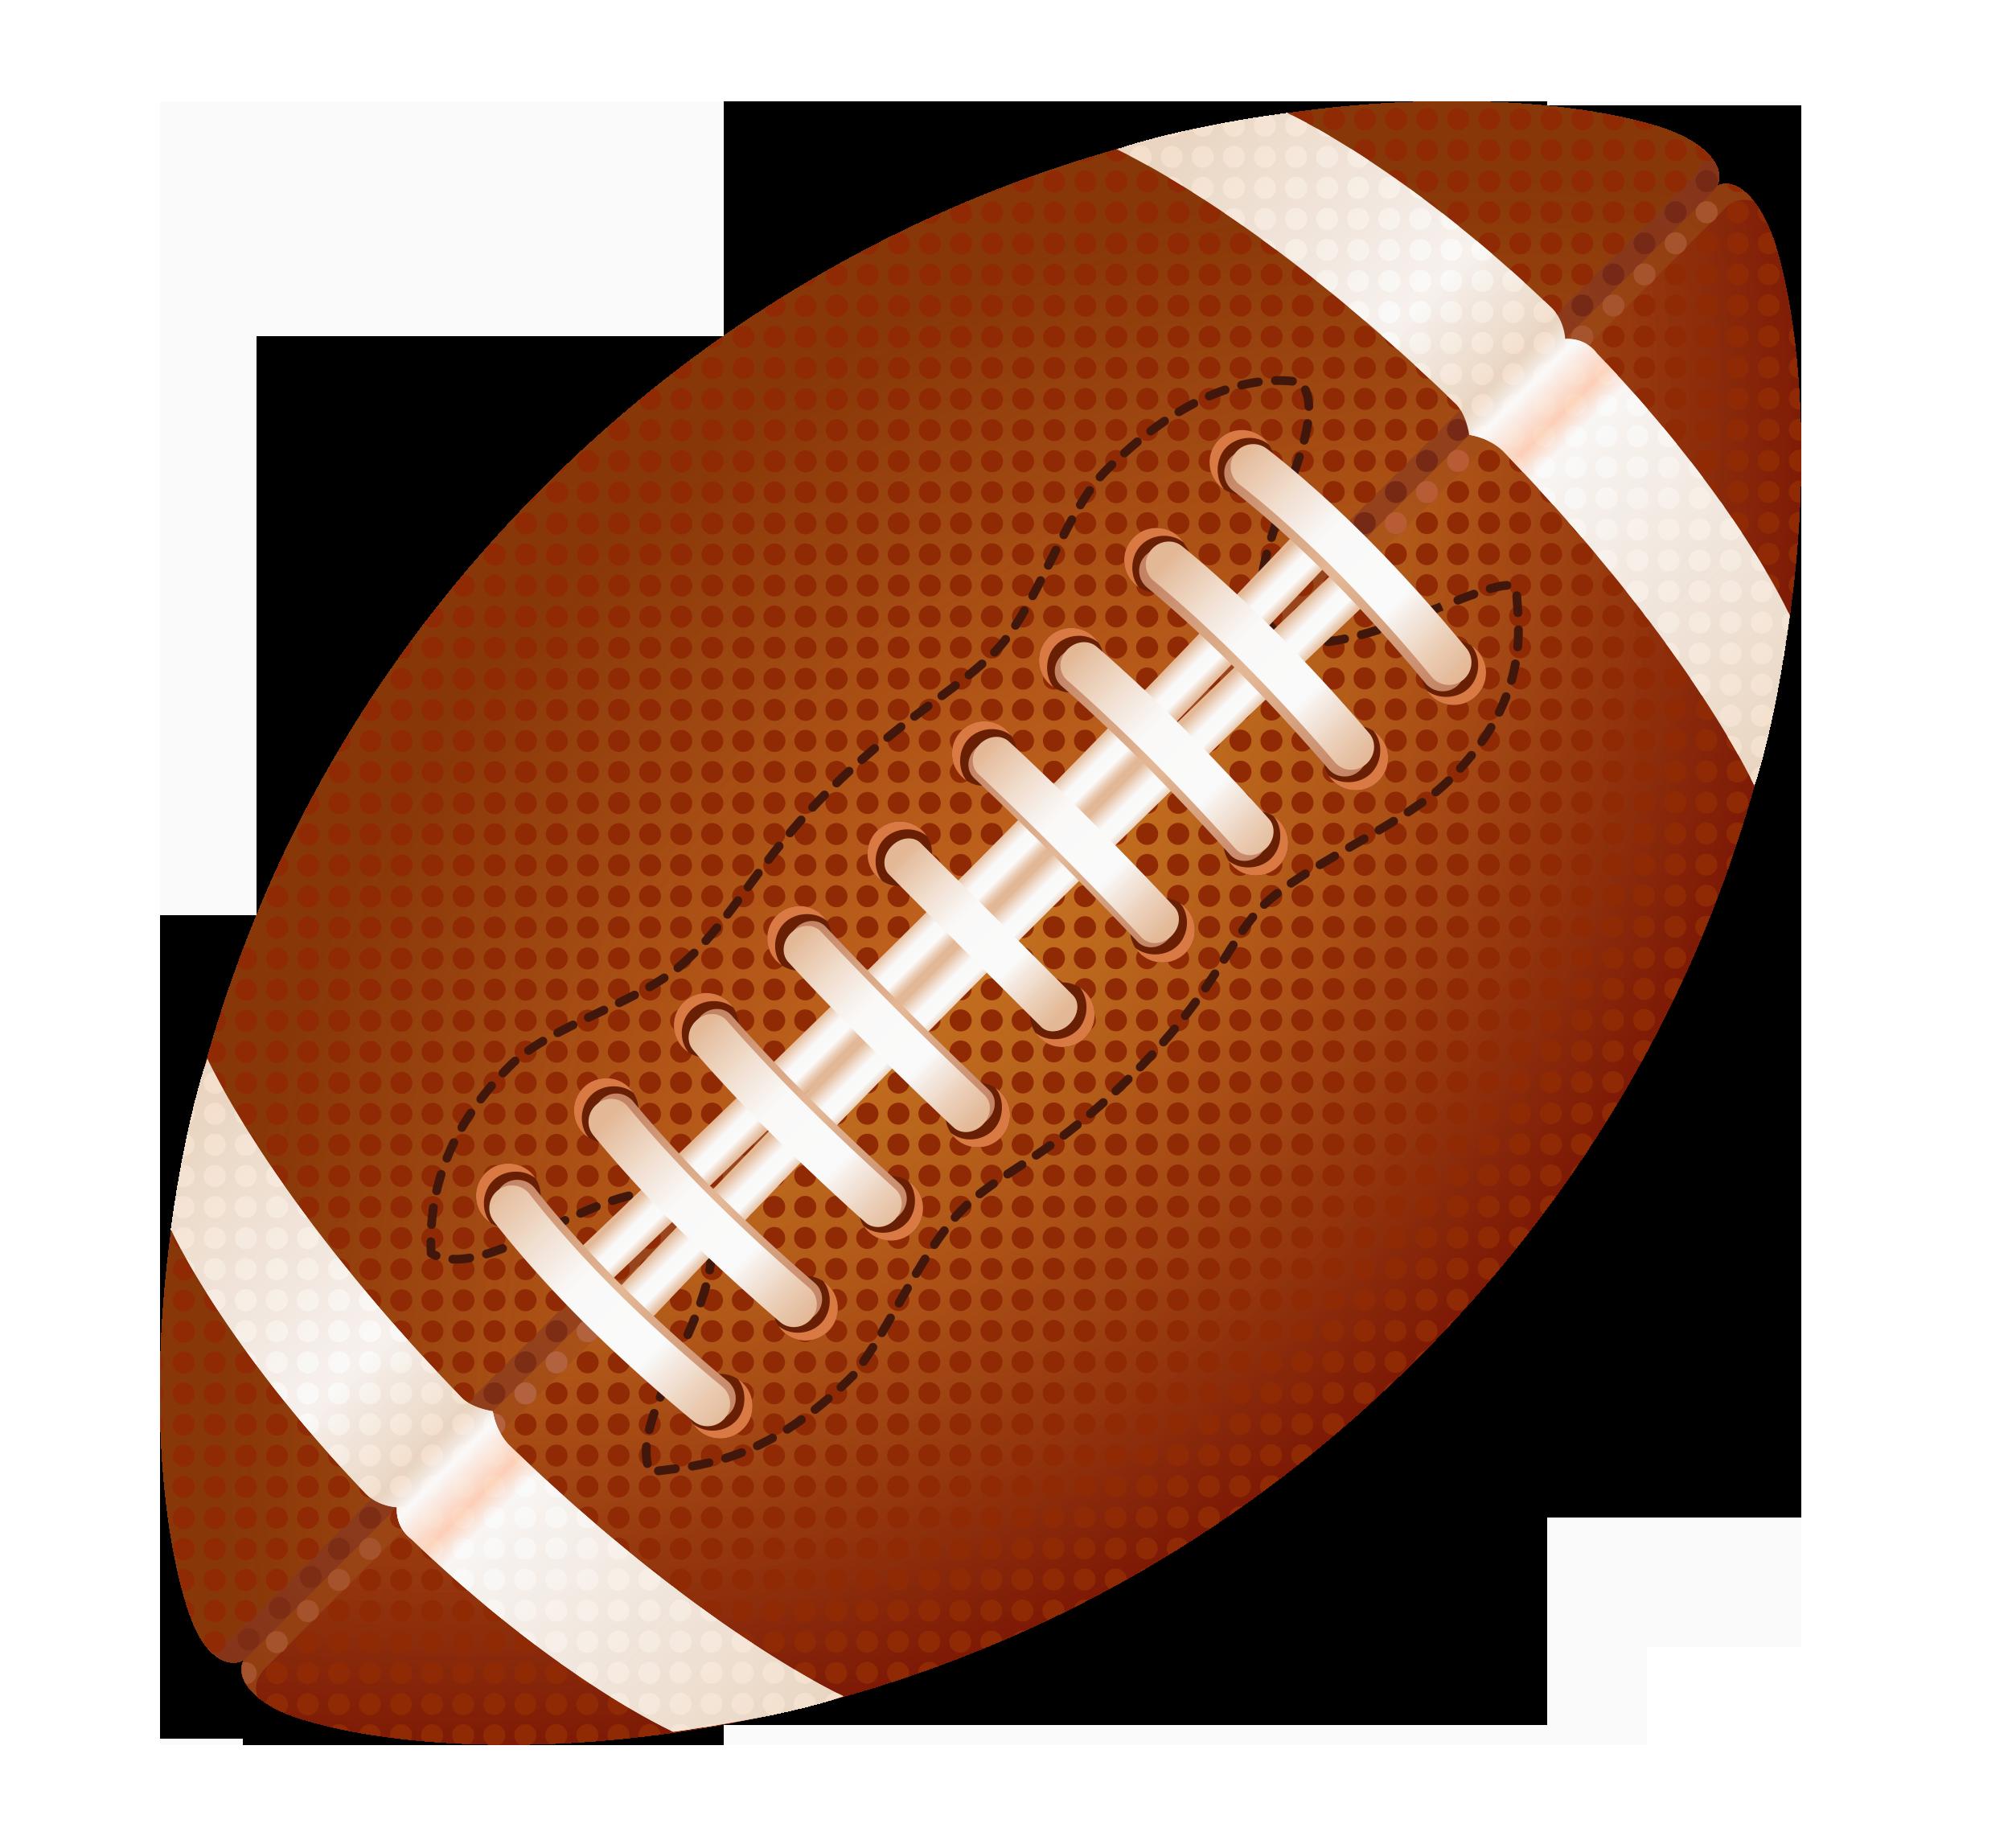 American Football Clipart .-American football clipart .-2